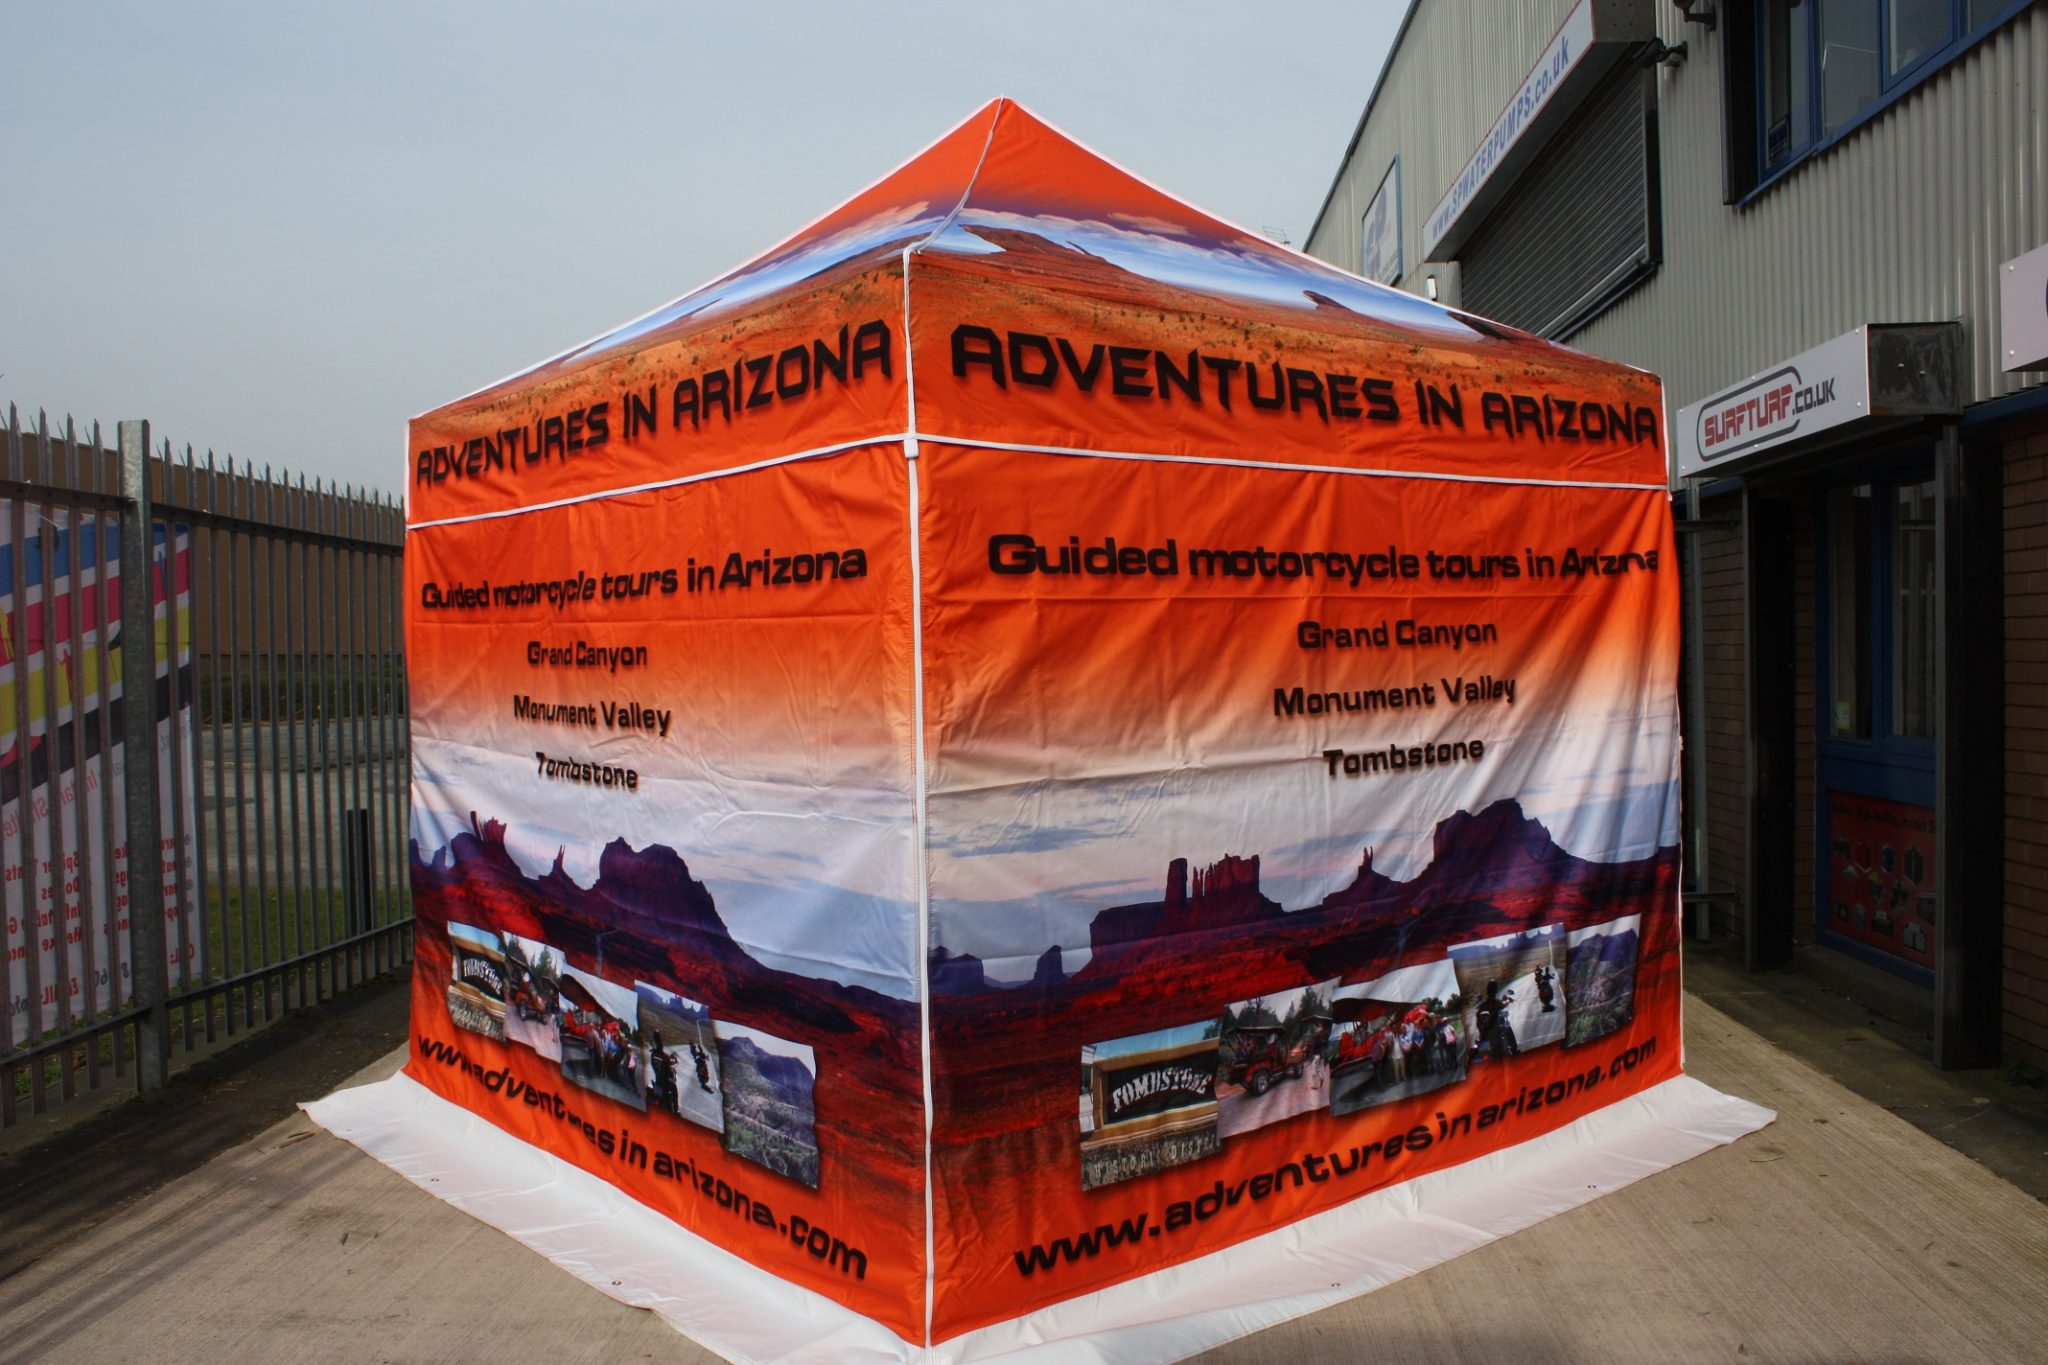 2896, 2896, Adventures in Arizona, Adventures-in-Arizona.jpg, 847260, https://www.surfturf.co.uk/wp-content/uploads/2018/11/Adventures-in-Arizona.jpg, https://www.surfturf.co.uk/custom-branding/adventures-in-arizona/, , 3, , , adventures-in-arizona, inherit, 333, 2018-11-20 10:16:45, 2018-11-20 10:18:02, 0, image/jpeg, image, jpeg, https://www.surfturf.co.uk/wp-includes/images/media/default.png, 2136, 1424, Array